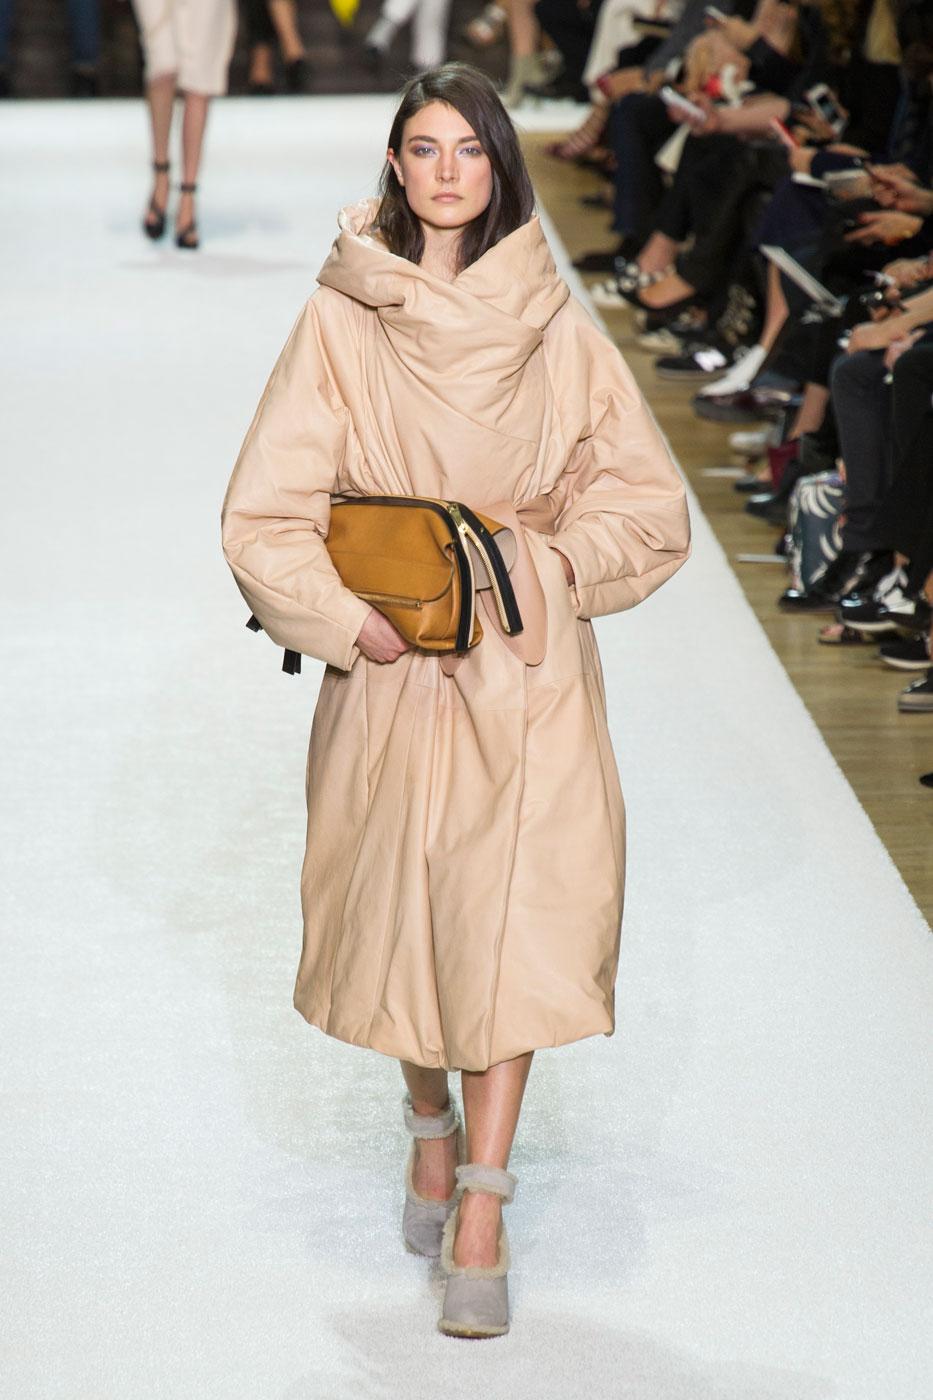 Сумка Givenchy купить, цена 2 500 руб, дата